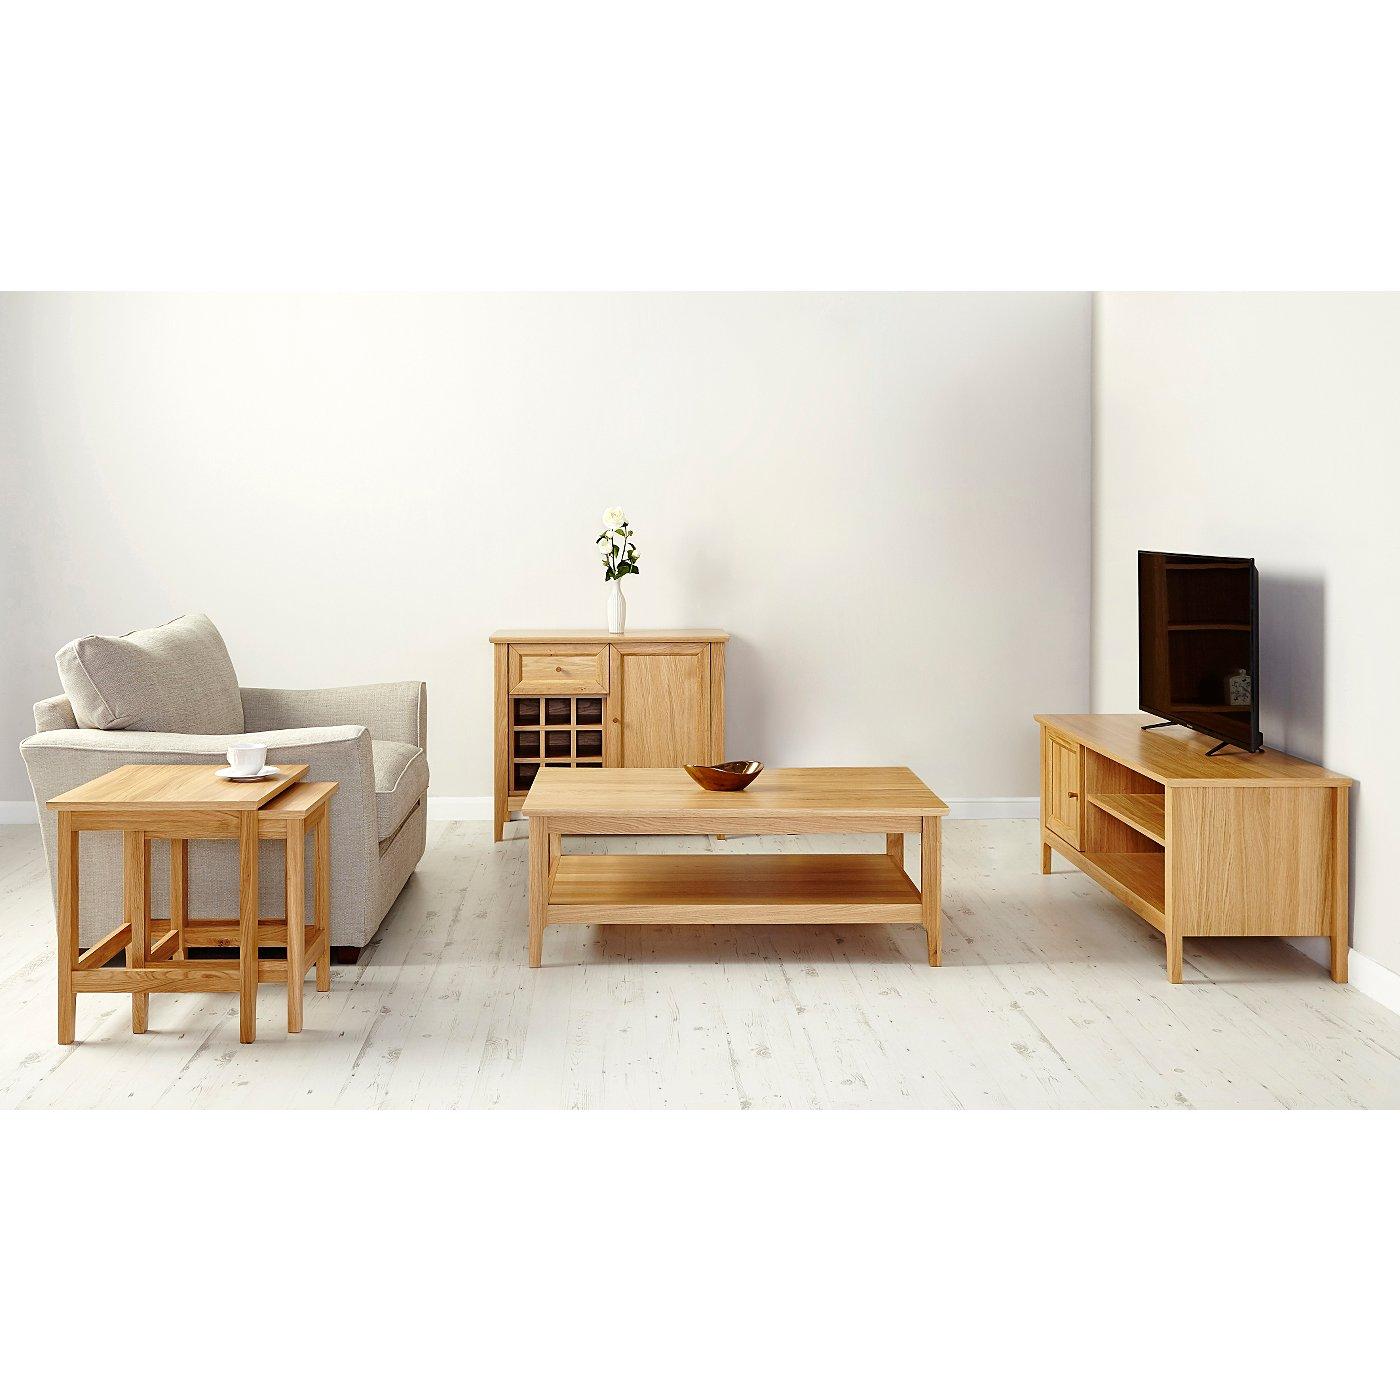 Ewan Living Room Furniture Set | View All | George at ASDA